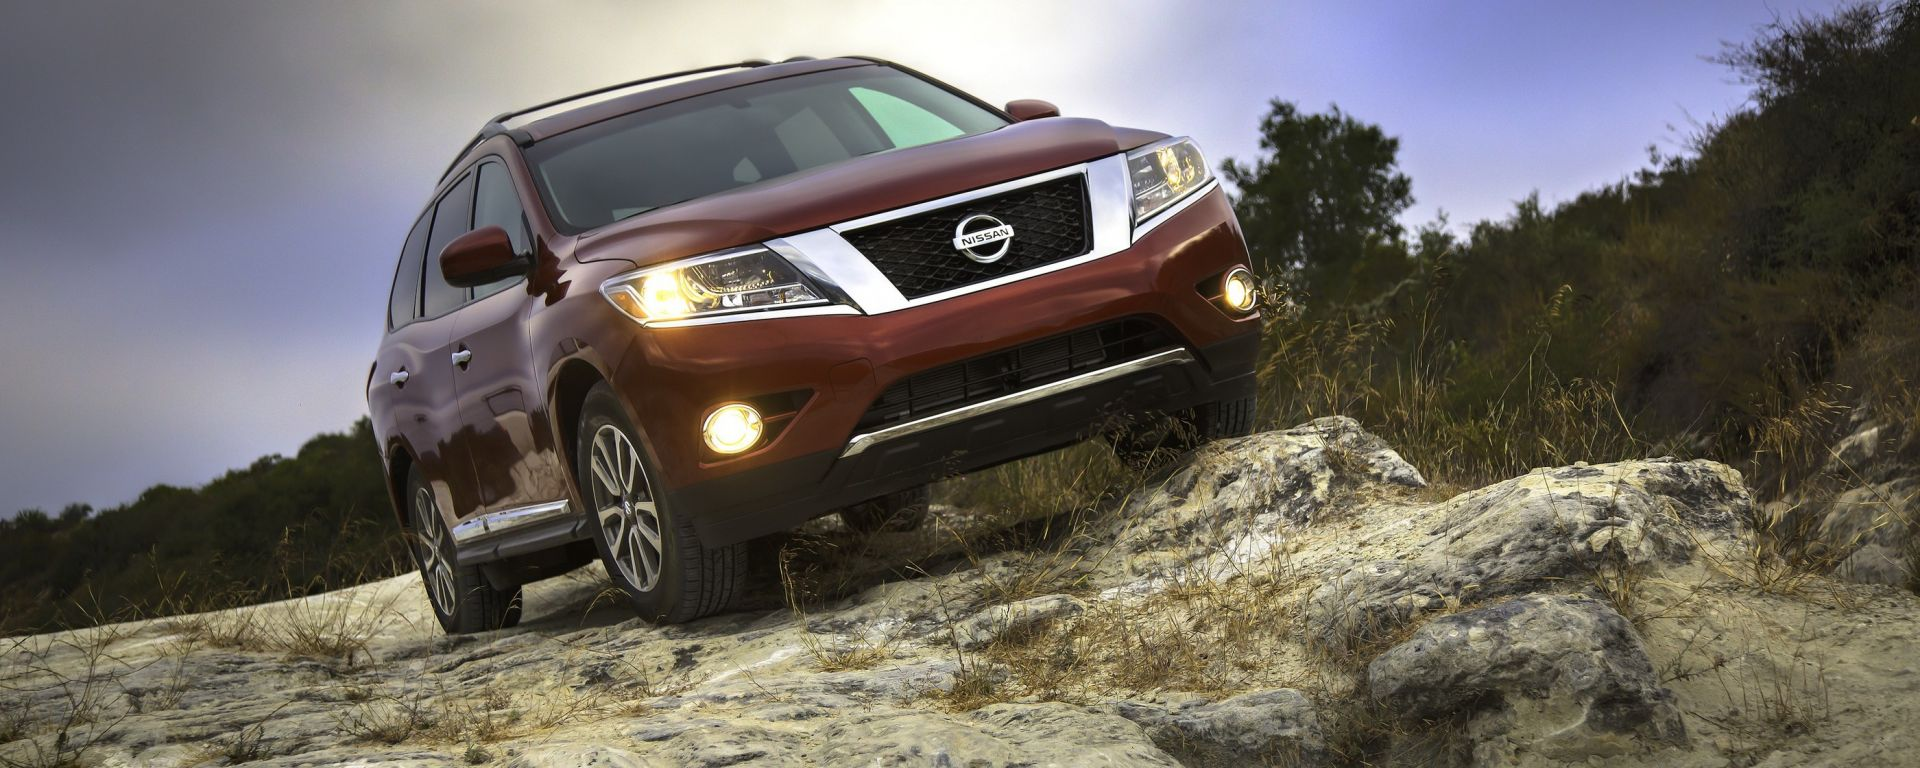 Nissan Pathfinder 2013, foto e video